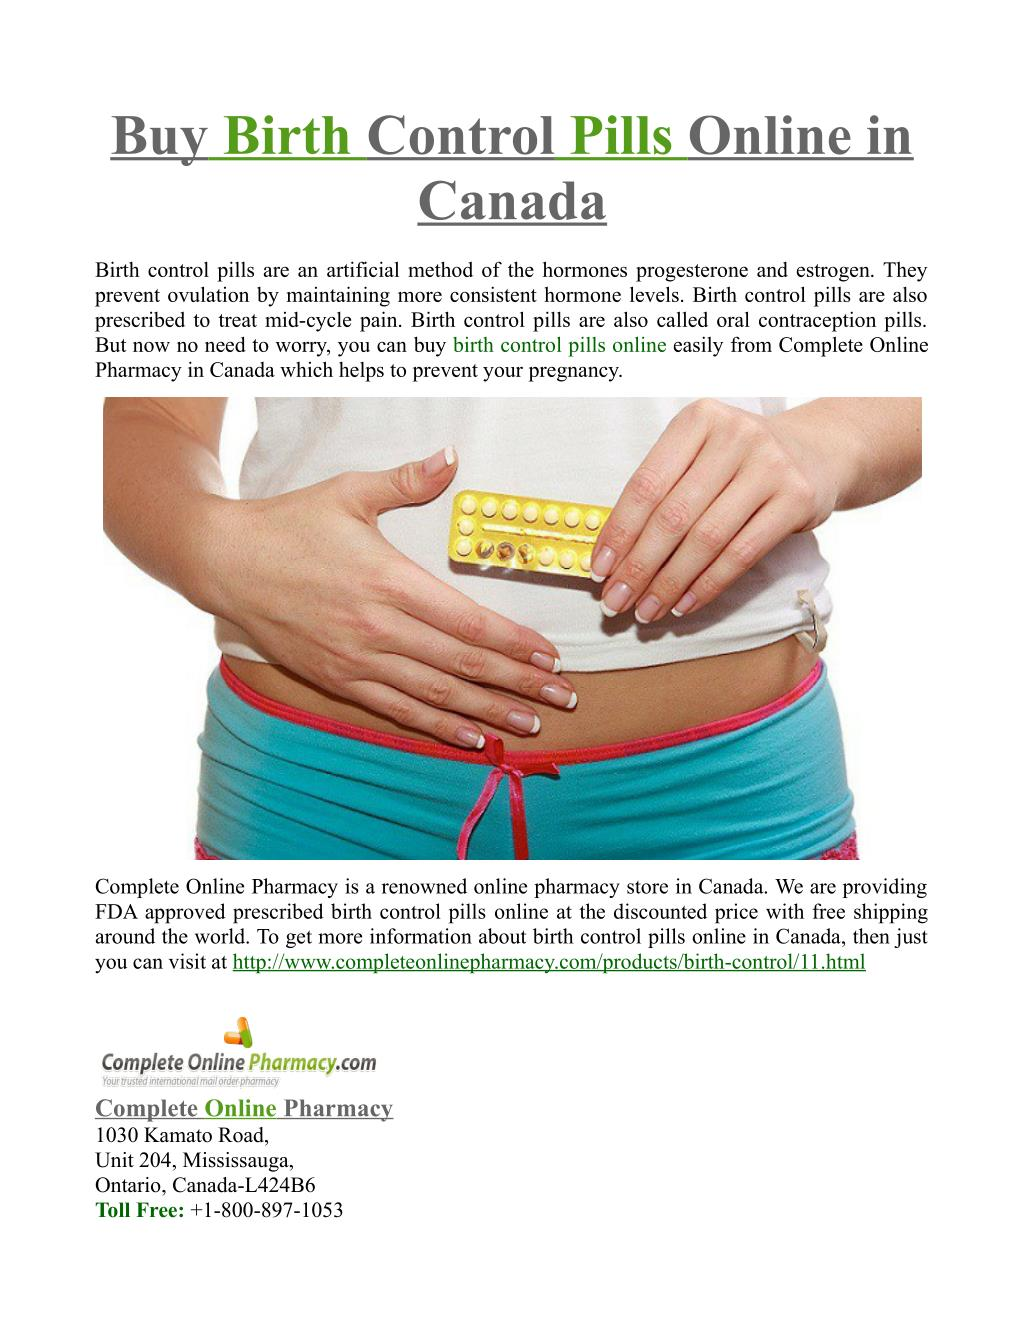 Buy Birth Control Pills Online In Canada PowerPoint